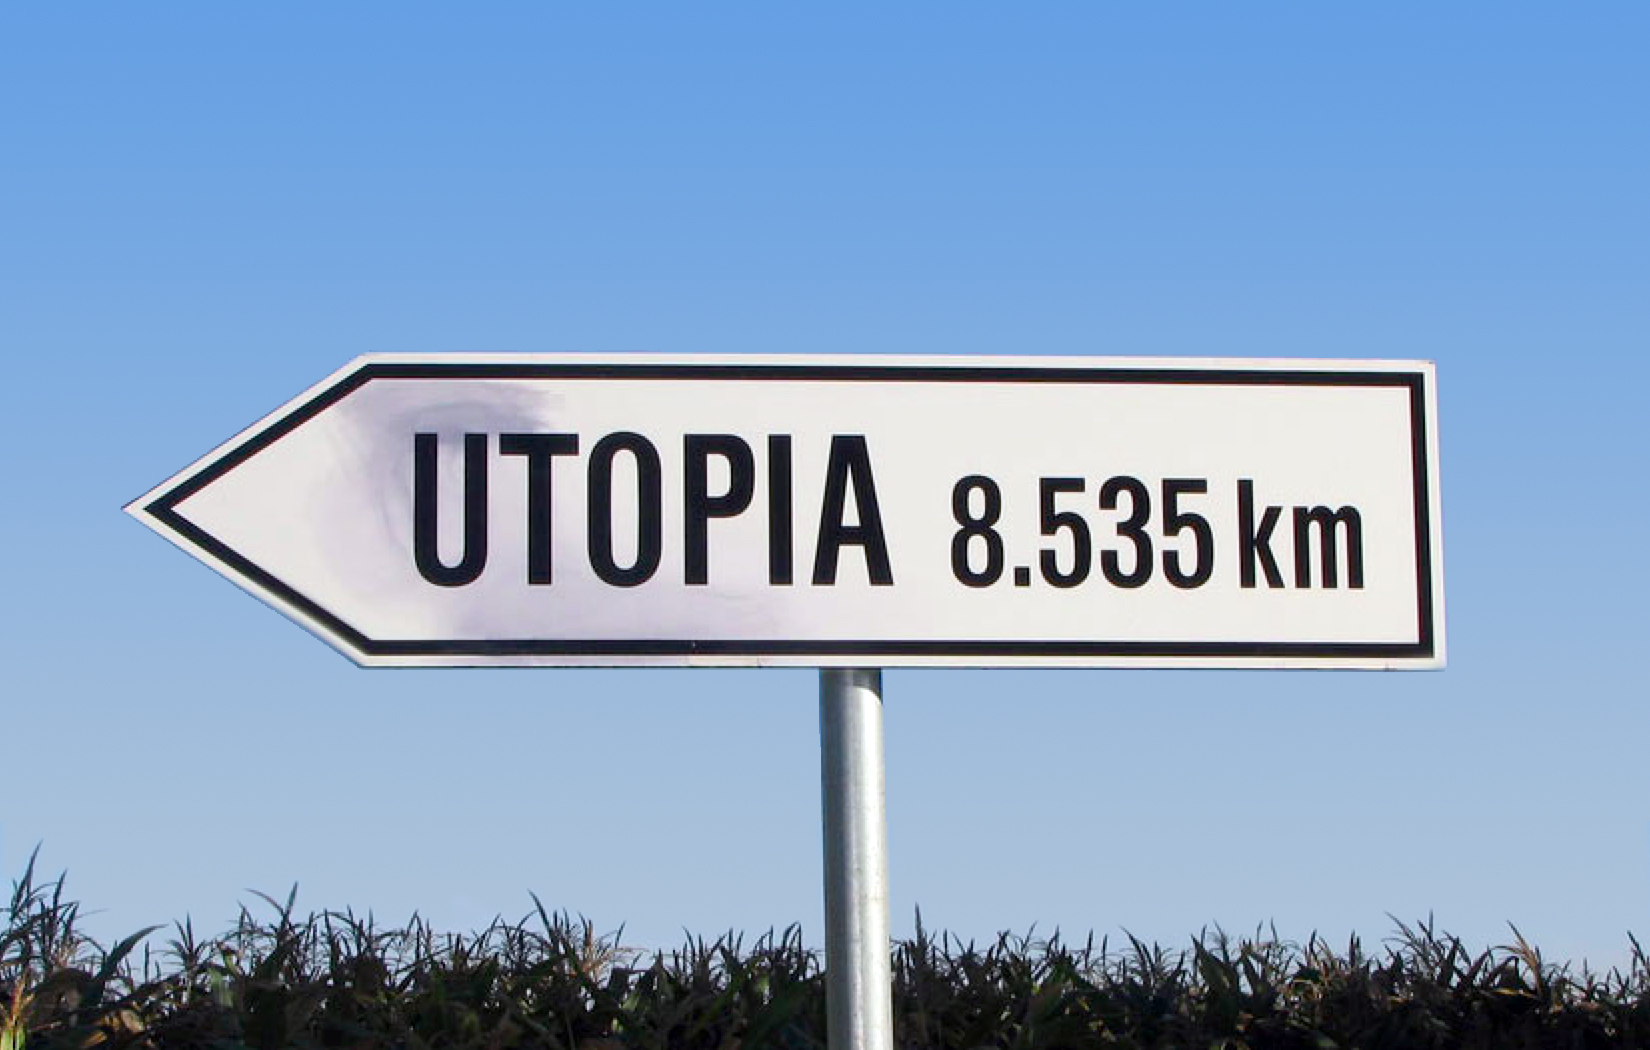 utopia_in_four_movements_filmstill5_utopiasign.jpg (1650×1050)